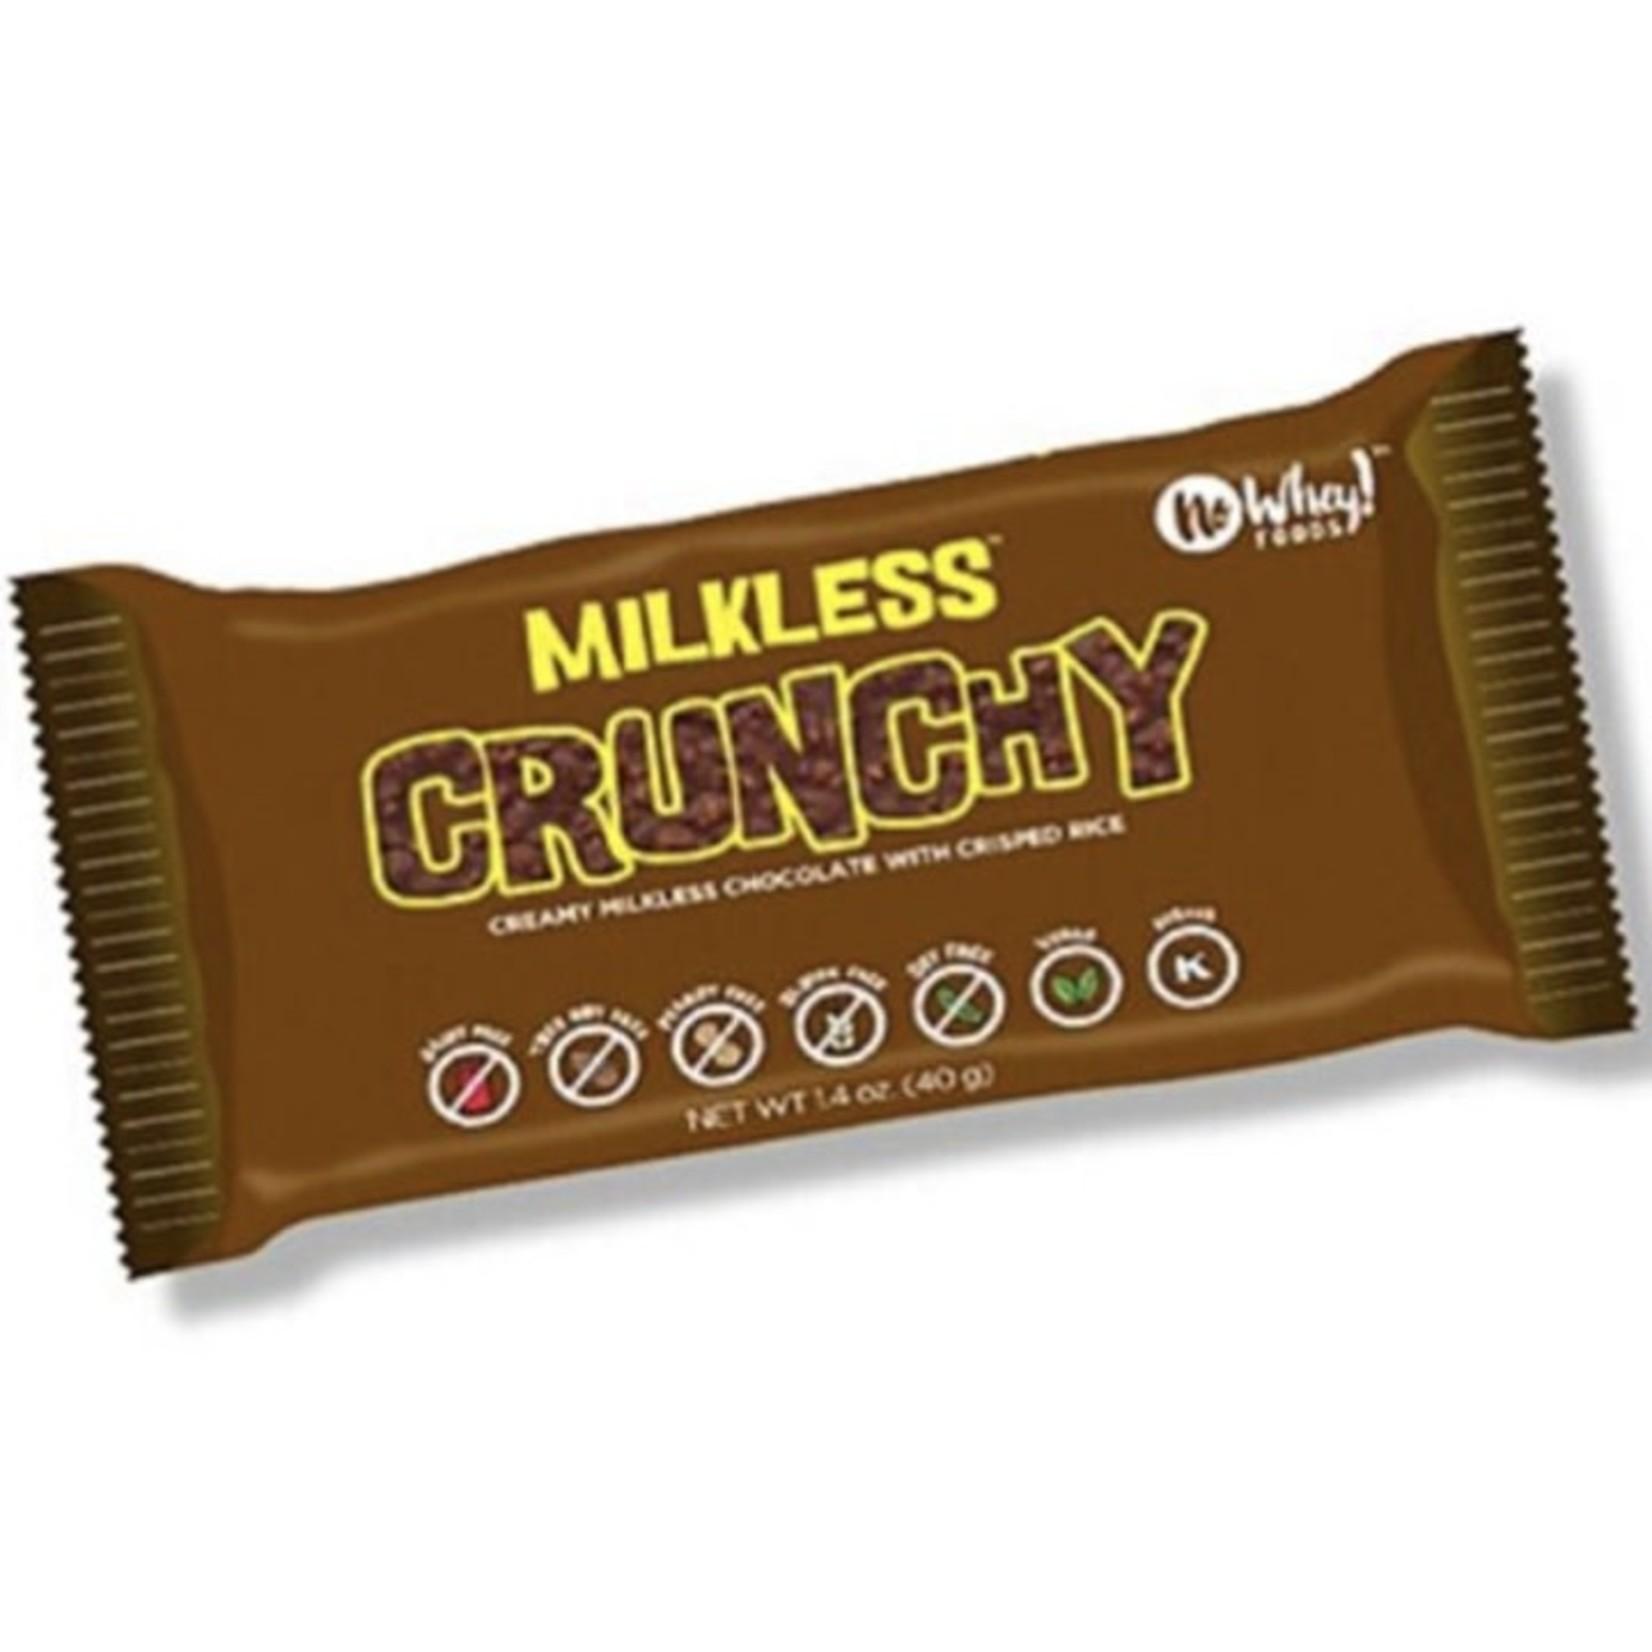 No Whey! No Whey! Milkless Crunchy Bar